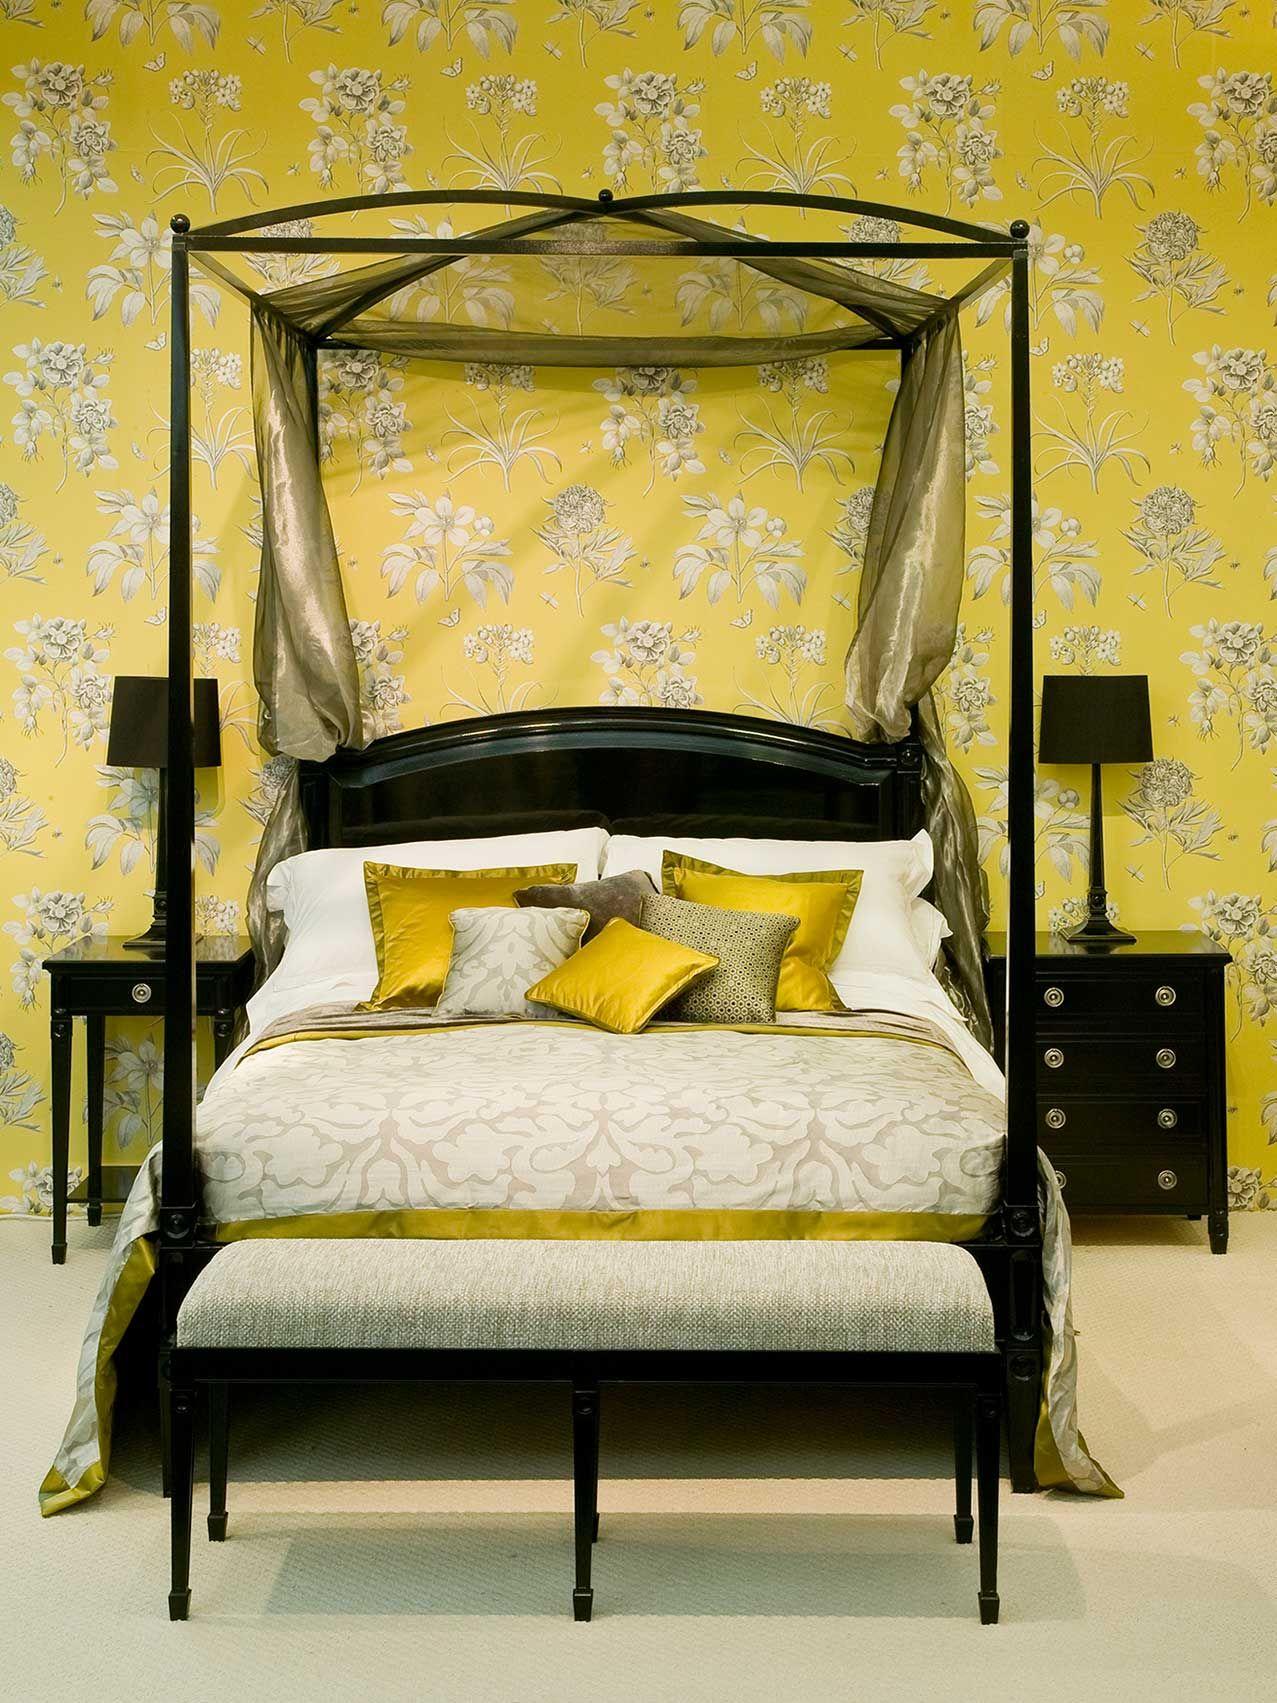 Bedroom Archives - Leporello | //4+// | Pinterest | Bedrooms